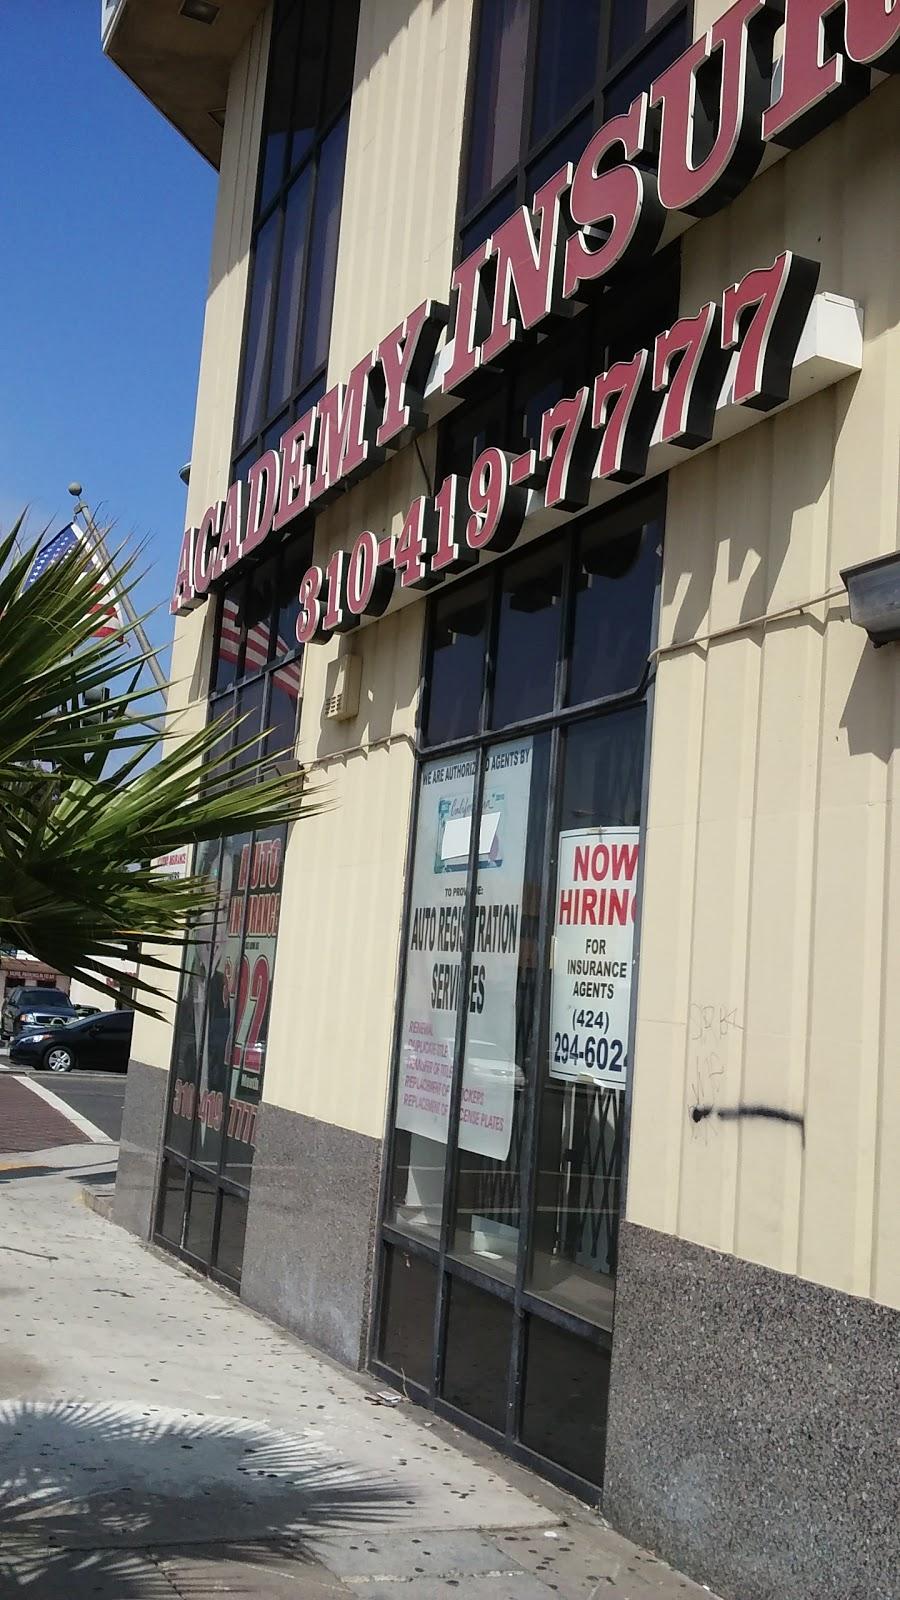 Academy Insurance | insurance agency | 170 South La Brea Ave, Inglewood, CA 90301, USA | 3104197777 OR +1 310-419-7777